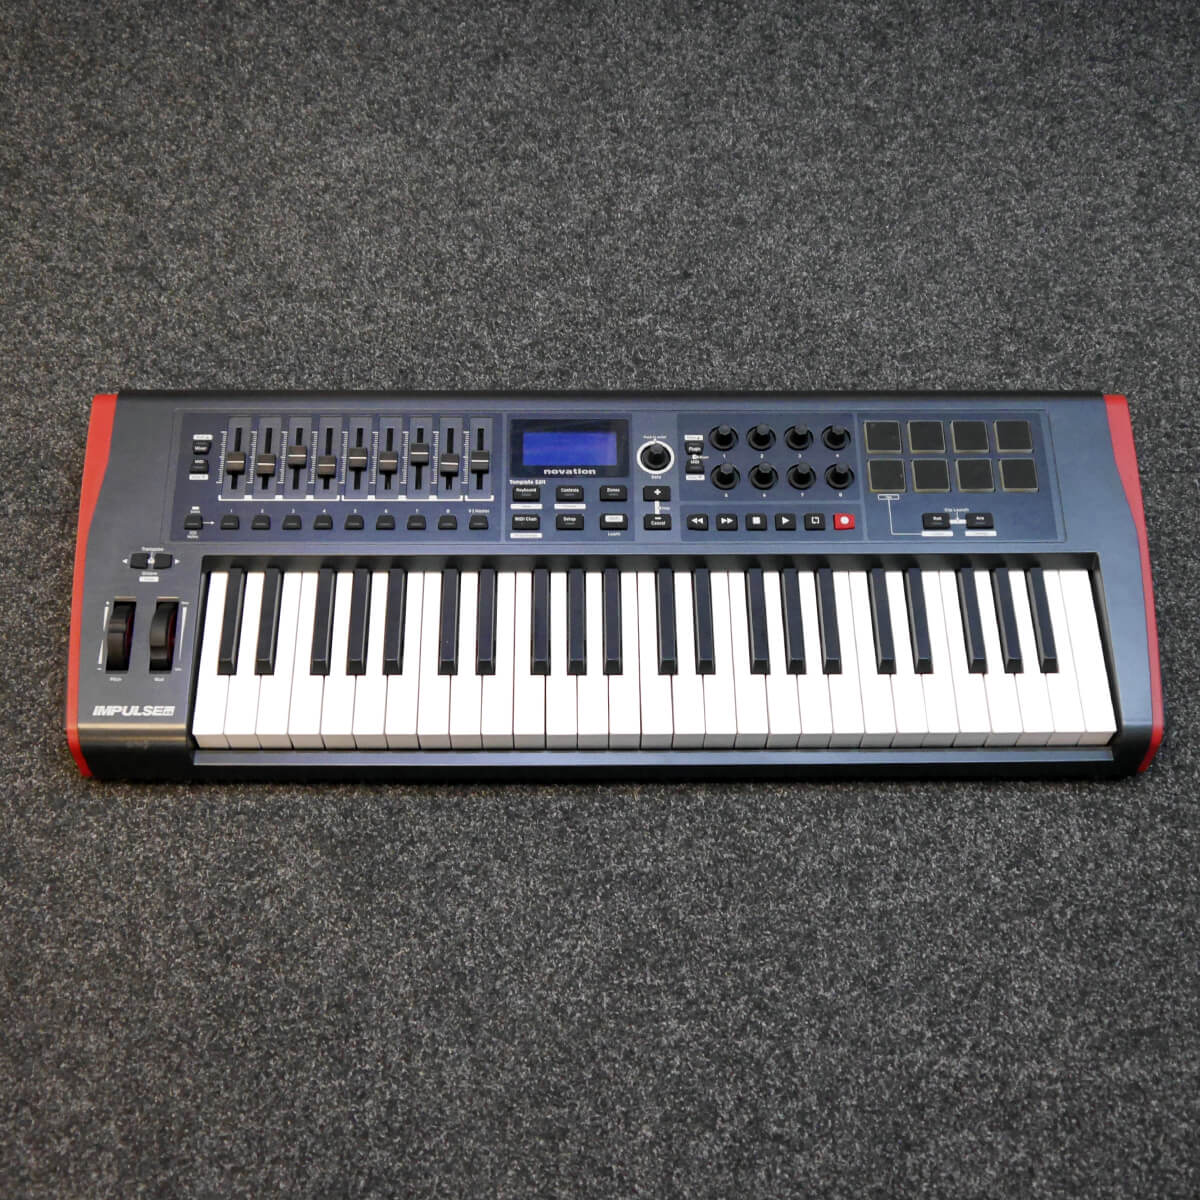 Novation IMPULSE 49 Midi Keyboard Controller - 2nd Hand